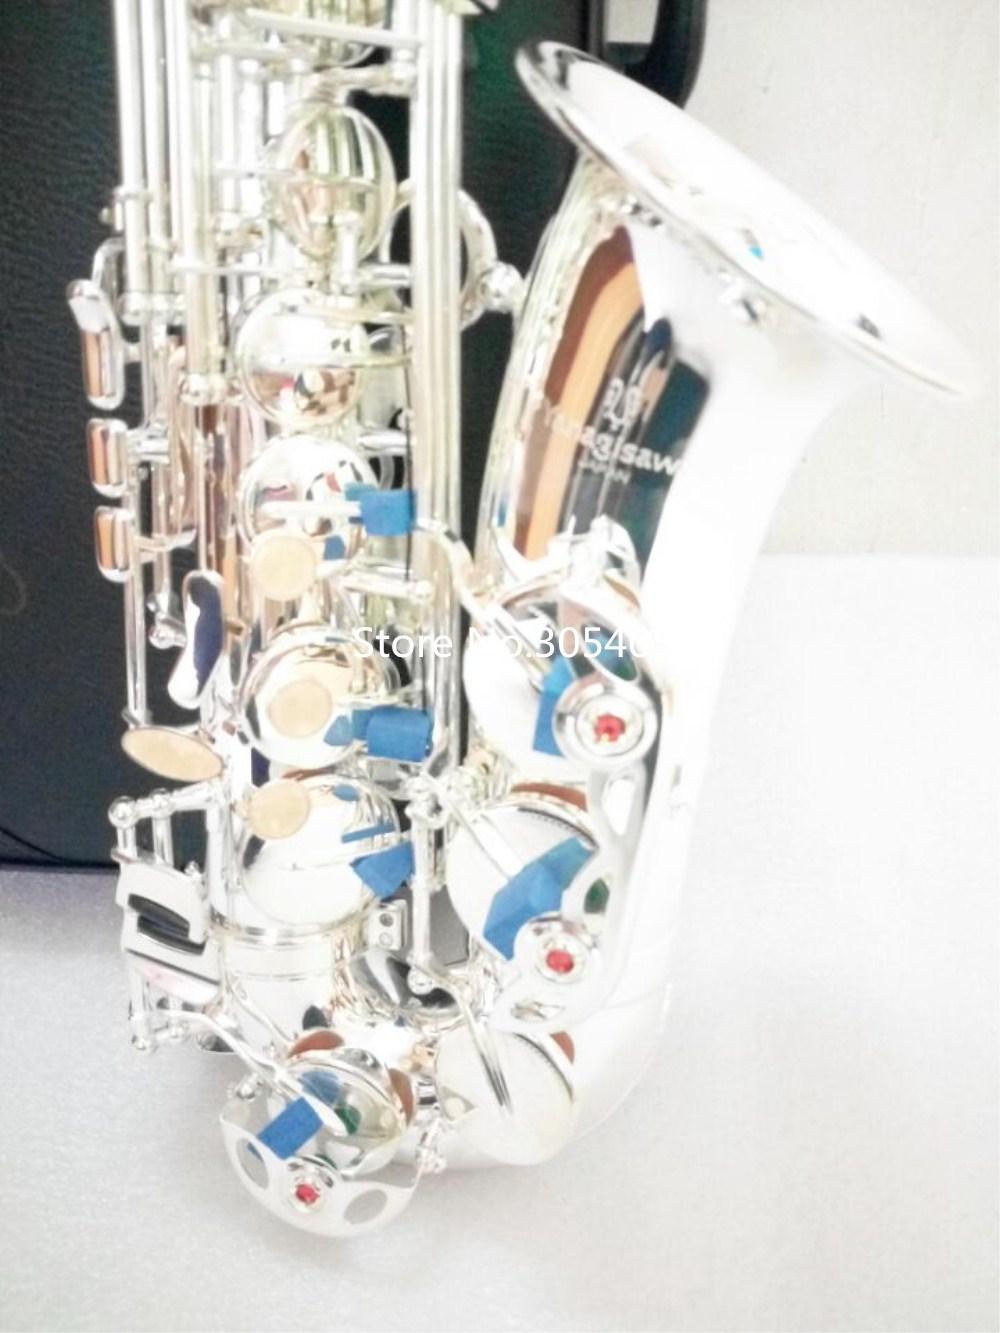 High Quality Brand NEW YANAGISAWA WO37 Alto Saxophone Silver Plated Professional Sax Mouthpiece With Case Free shipping free shipping new high quality tenor saxophone france r54 b flat black gold nickel professional musical instruments